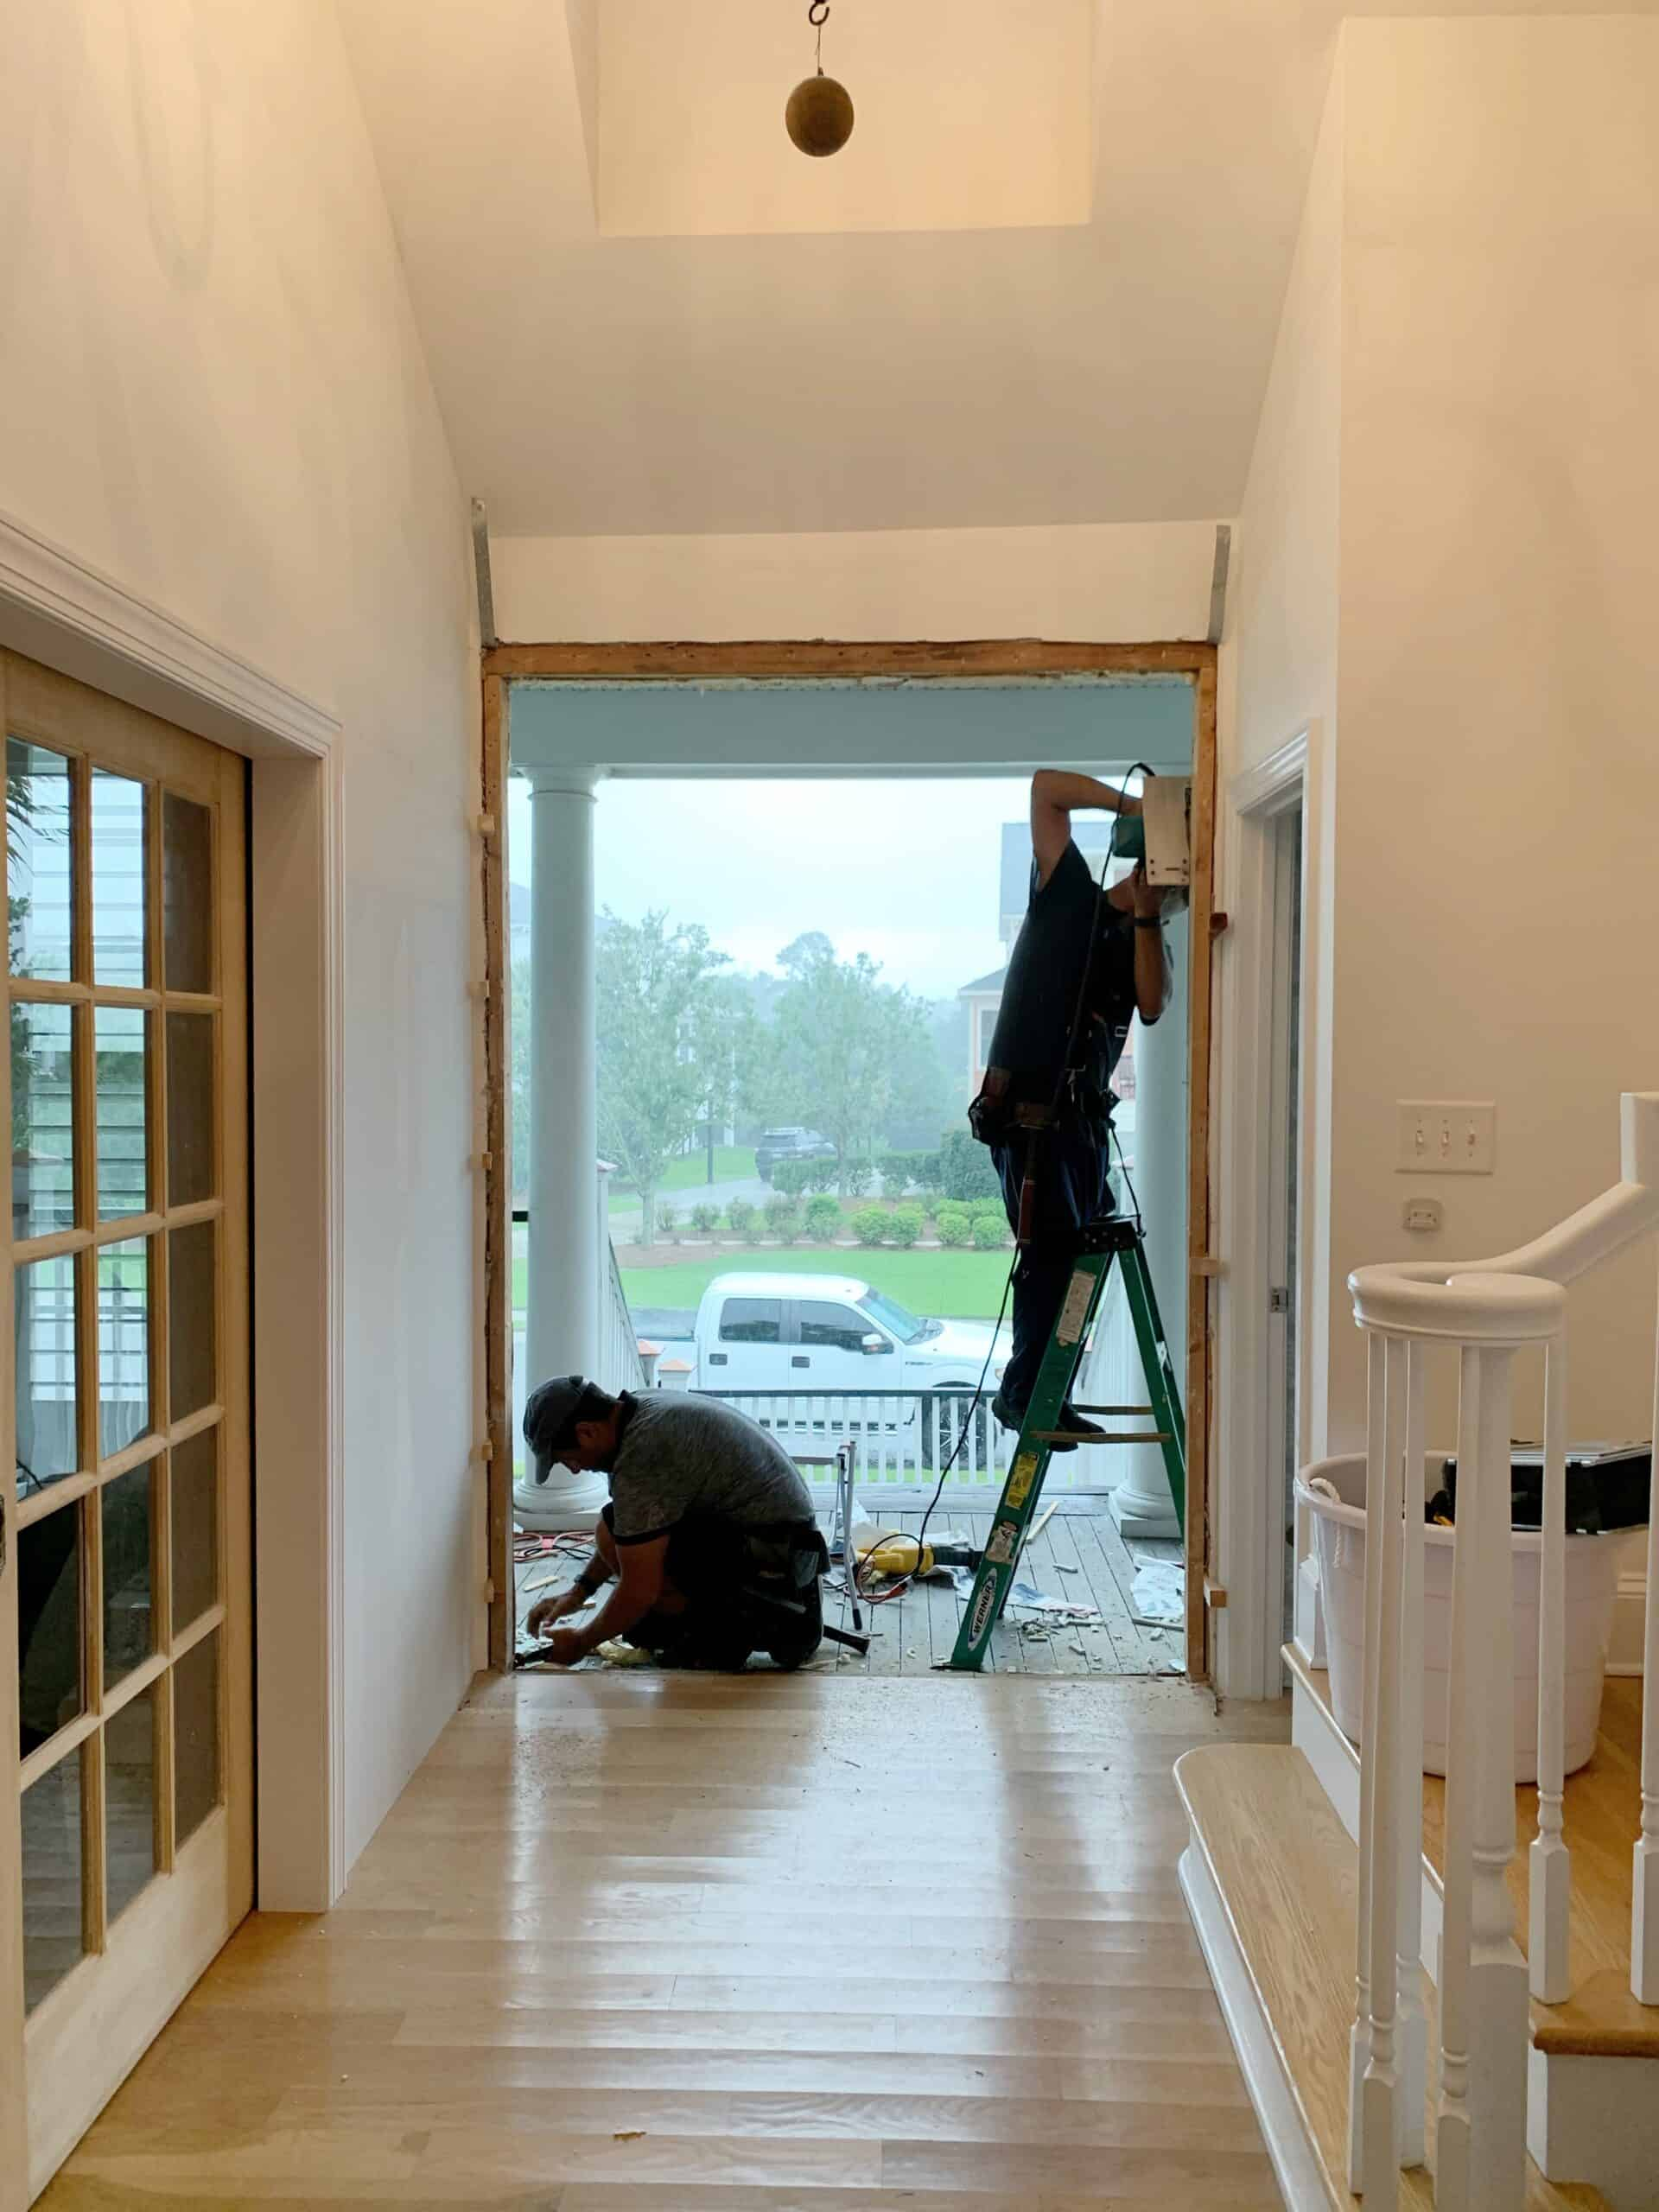 How we replaced our single front door with double glass front doors.  #frontdoors #doors #frontporch #southernliving #beachhouse #coastalcottage #frontdoordesign #doublefrontdoors #jeldwen